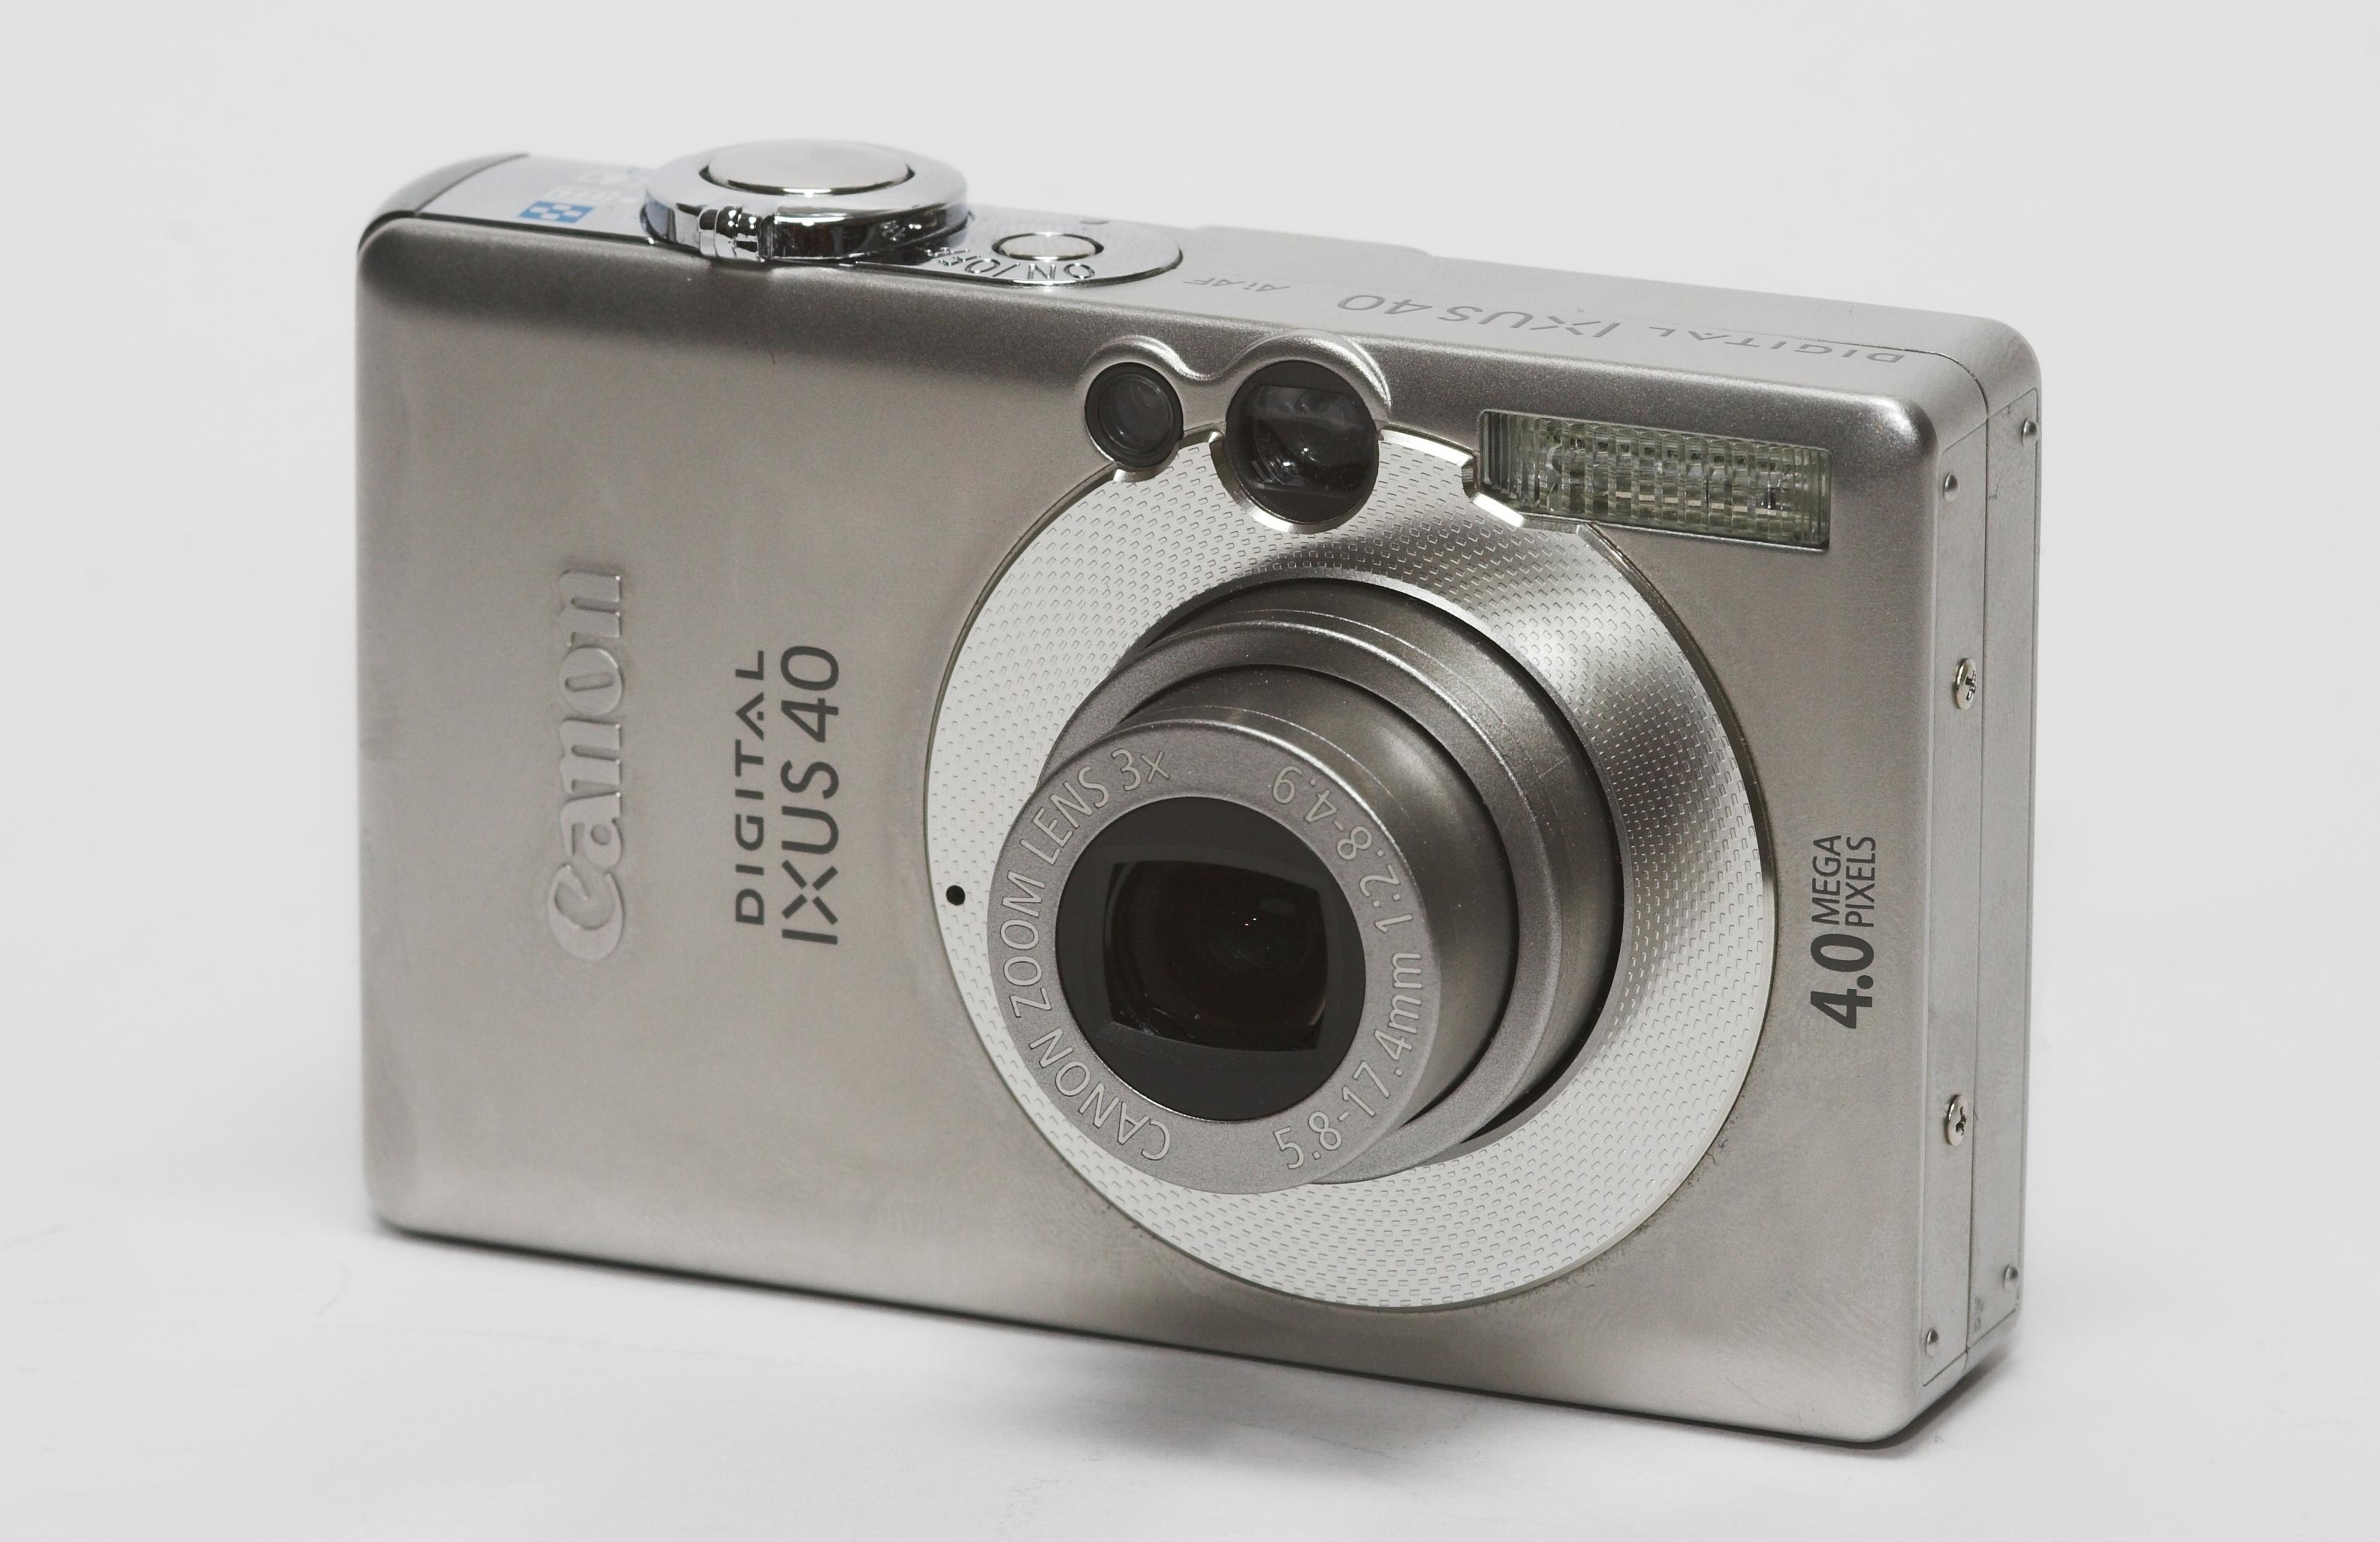 File:Canon Digital Ixus 40.jpg